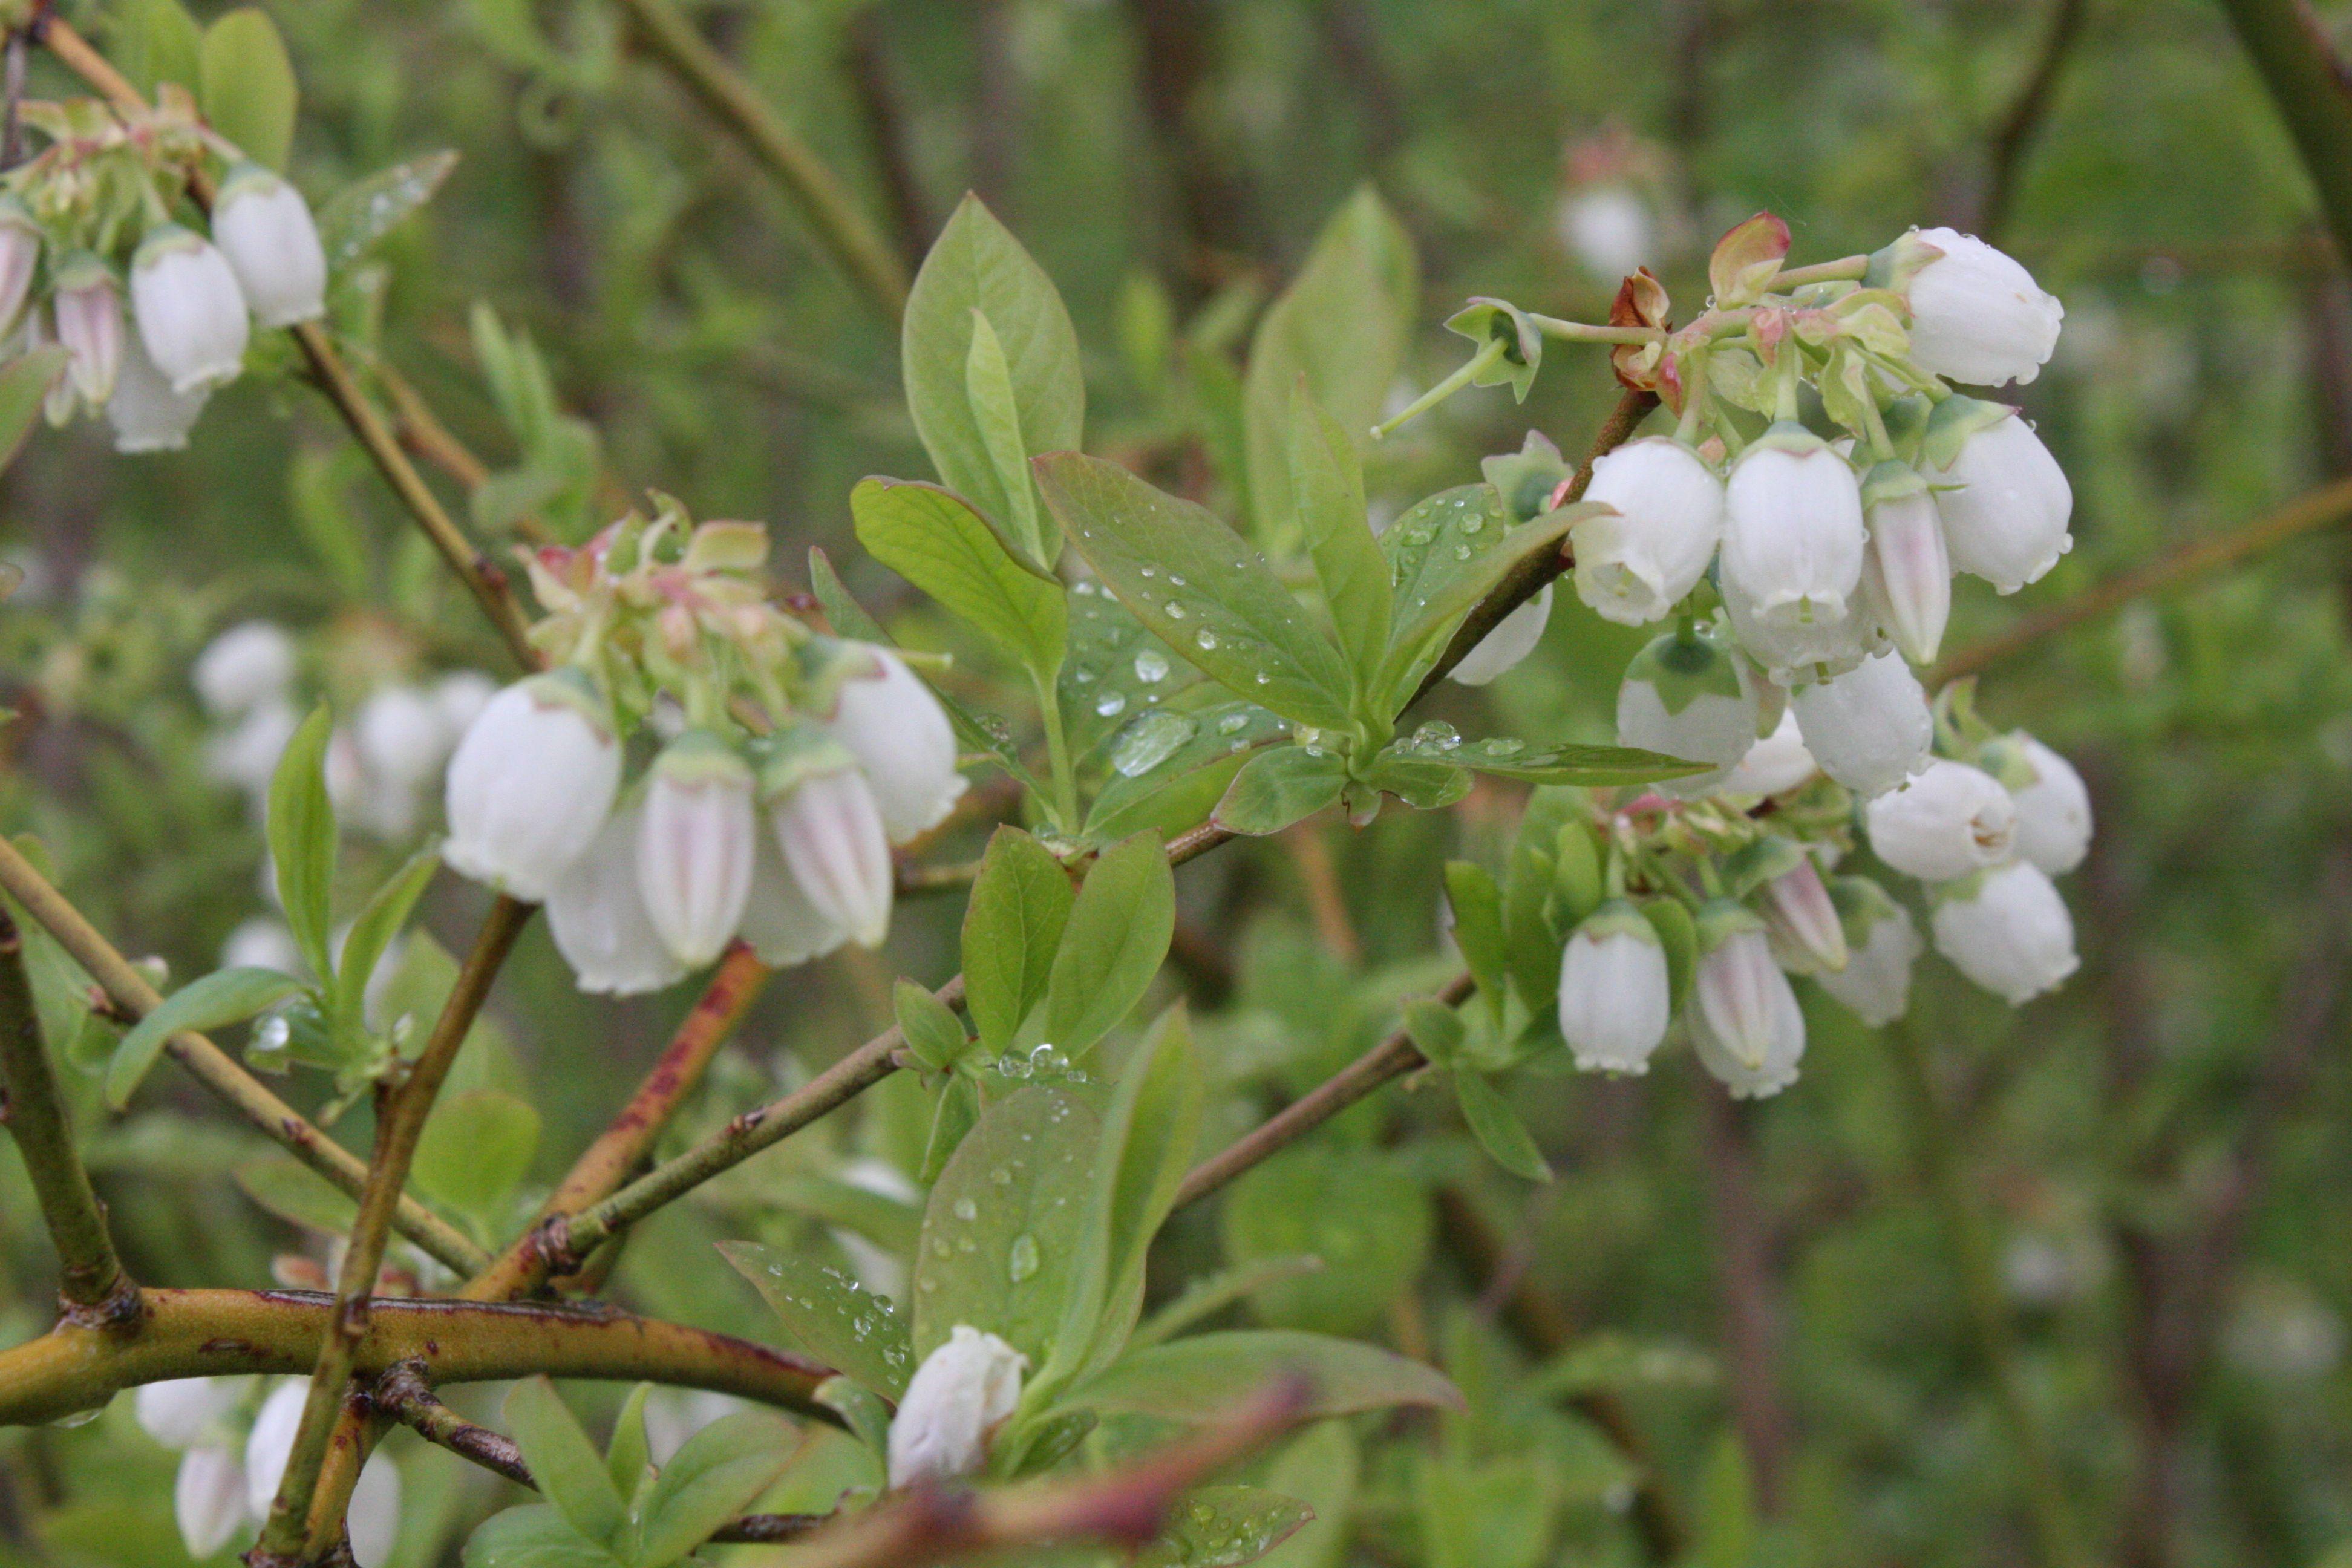 Blueberries after rain in spring 2014 at Lavender Backyard Garden, Hamilton, New Zealand